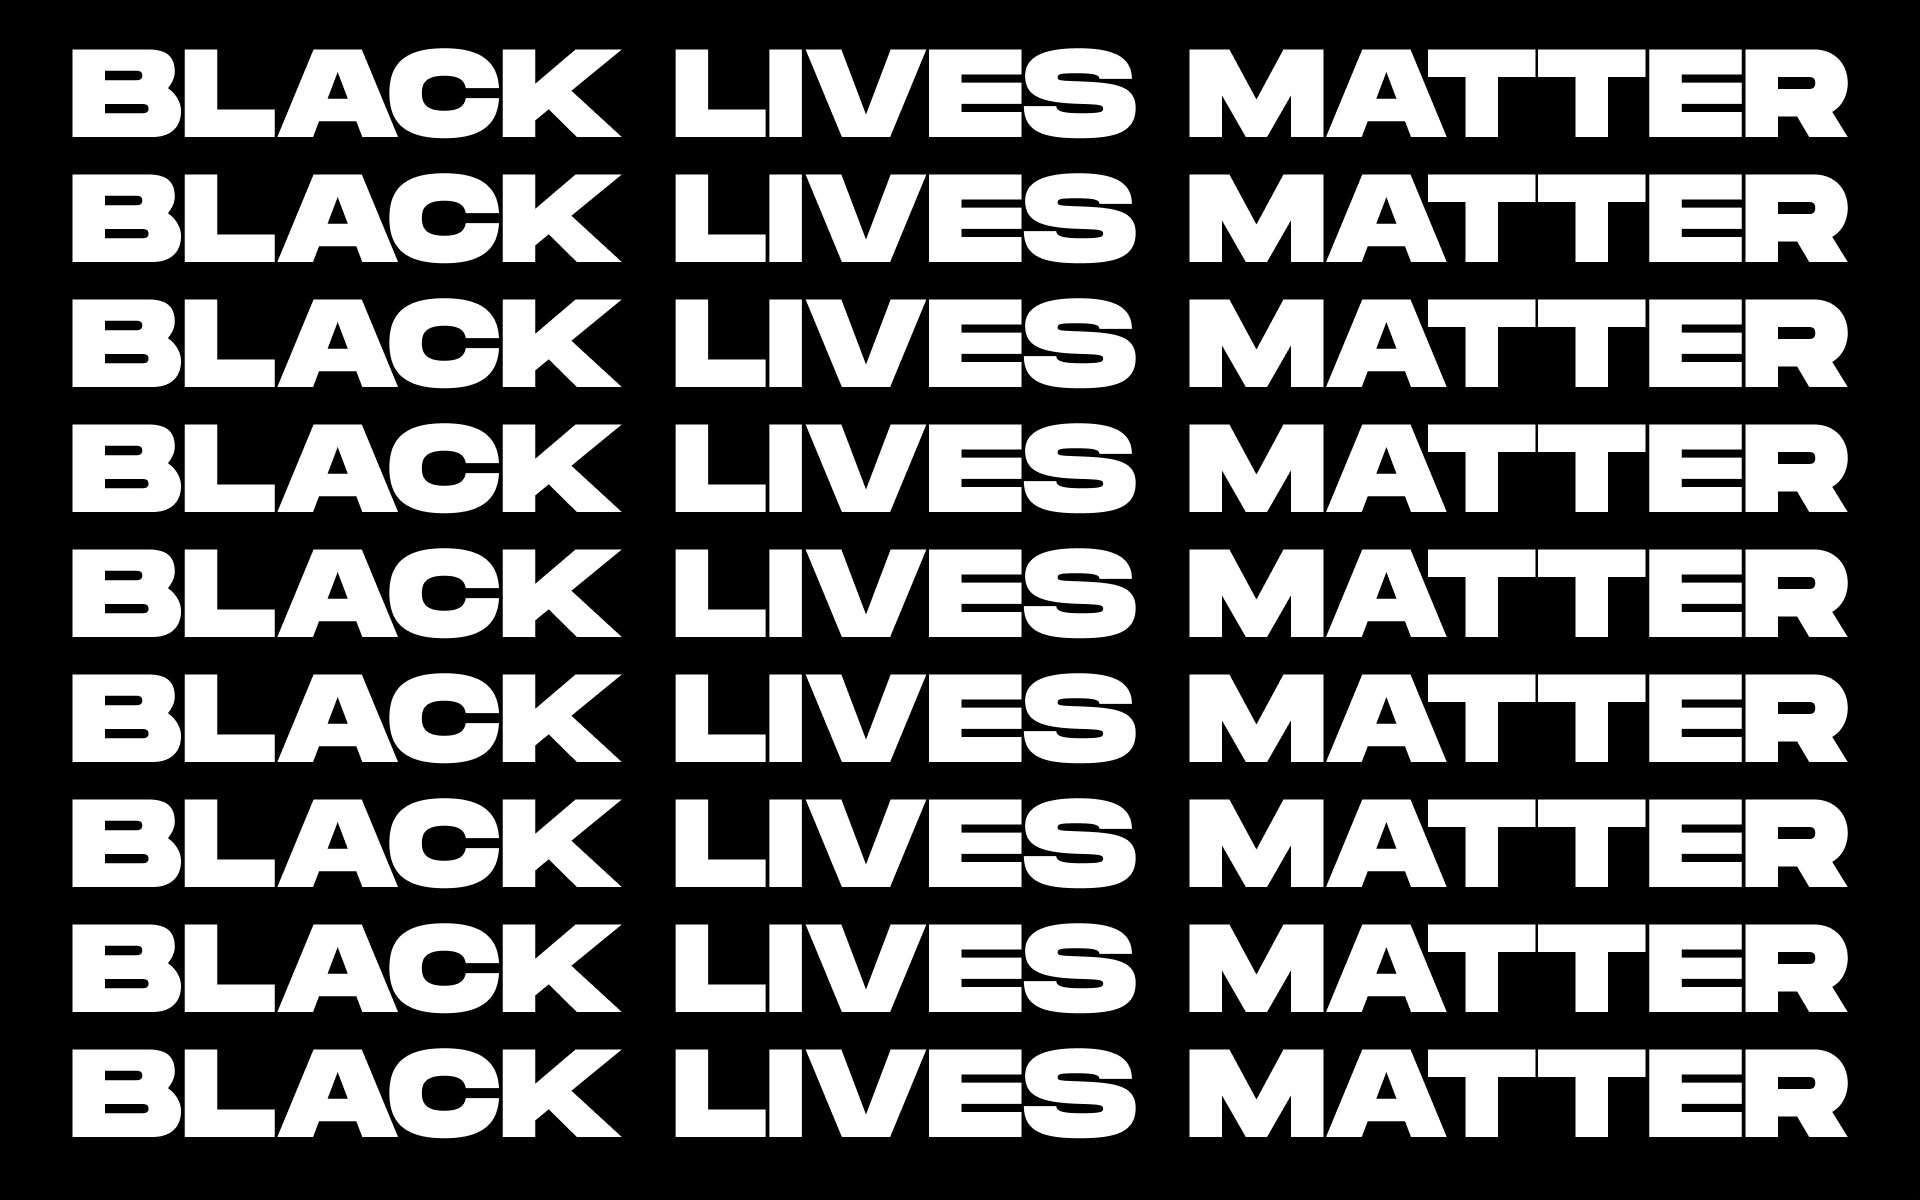 We Stand for Black Lives